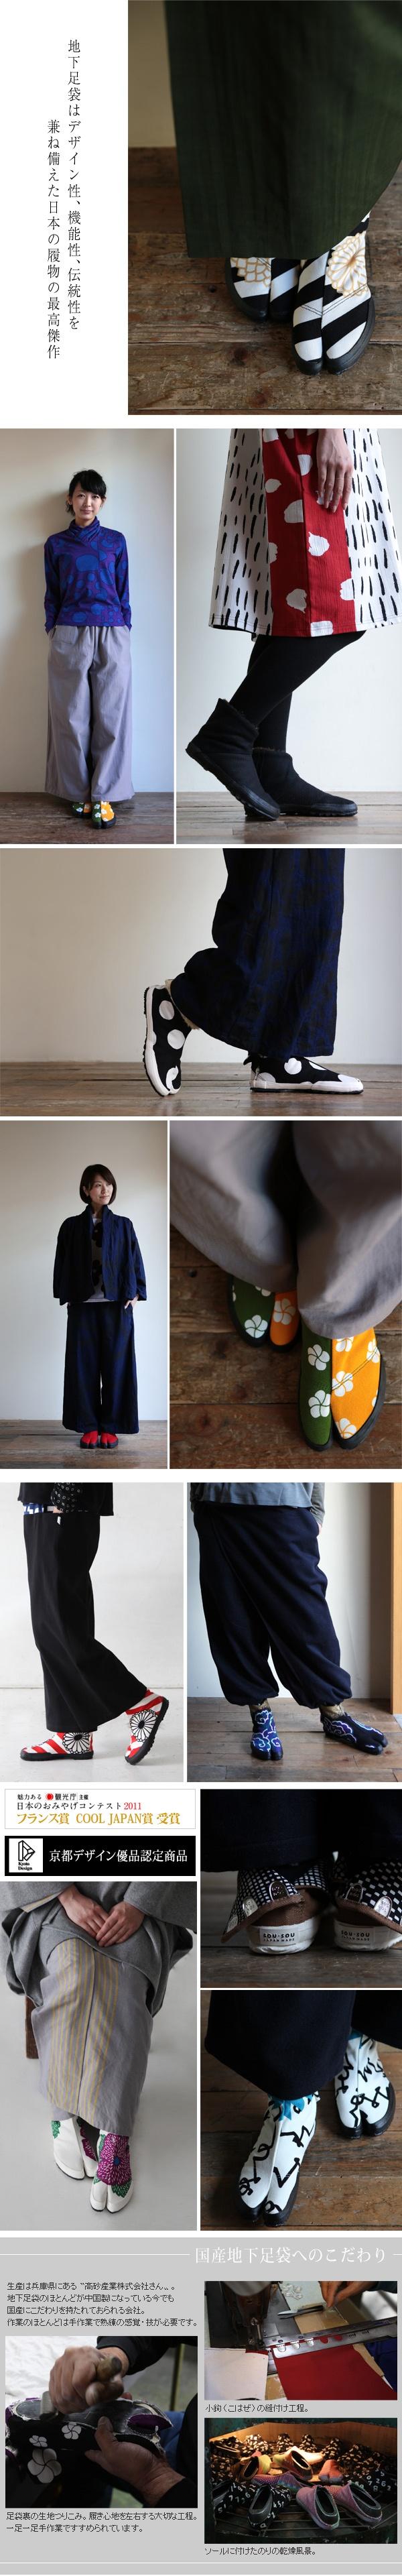 SOU・SOU足袋 国産貼付地下足袋 - ポップでカラフルな色柄の地下足袋